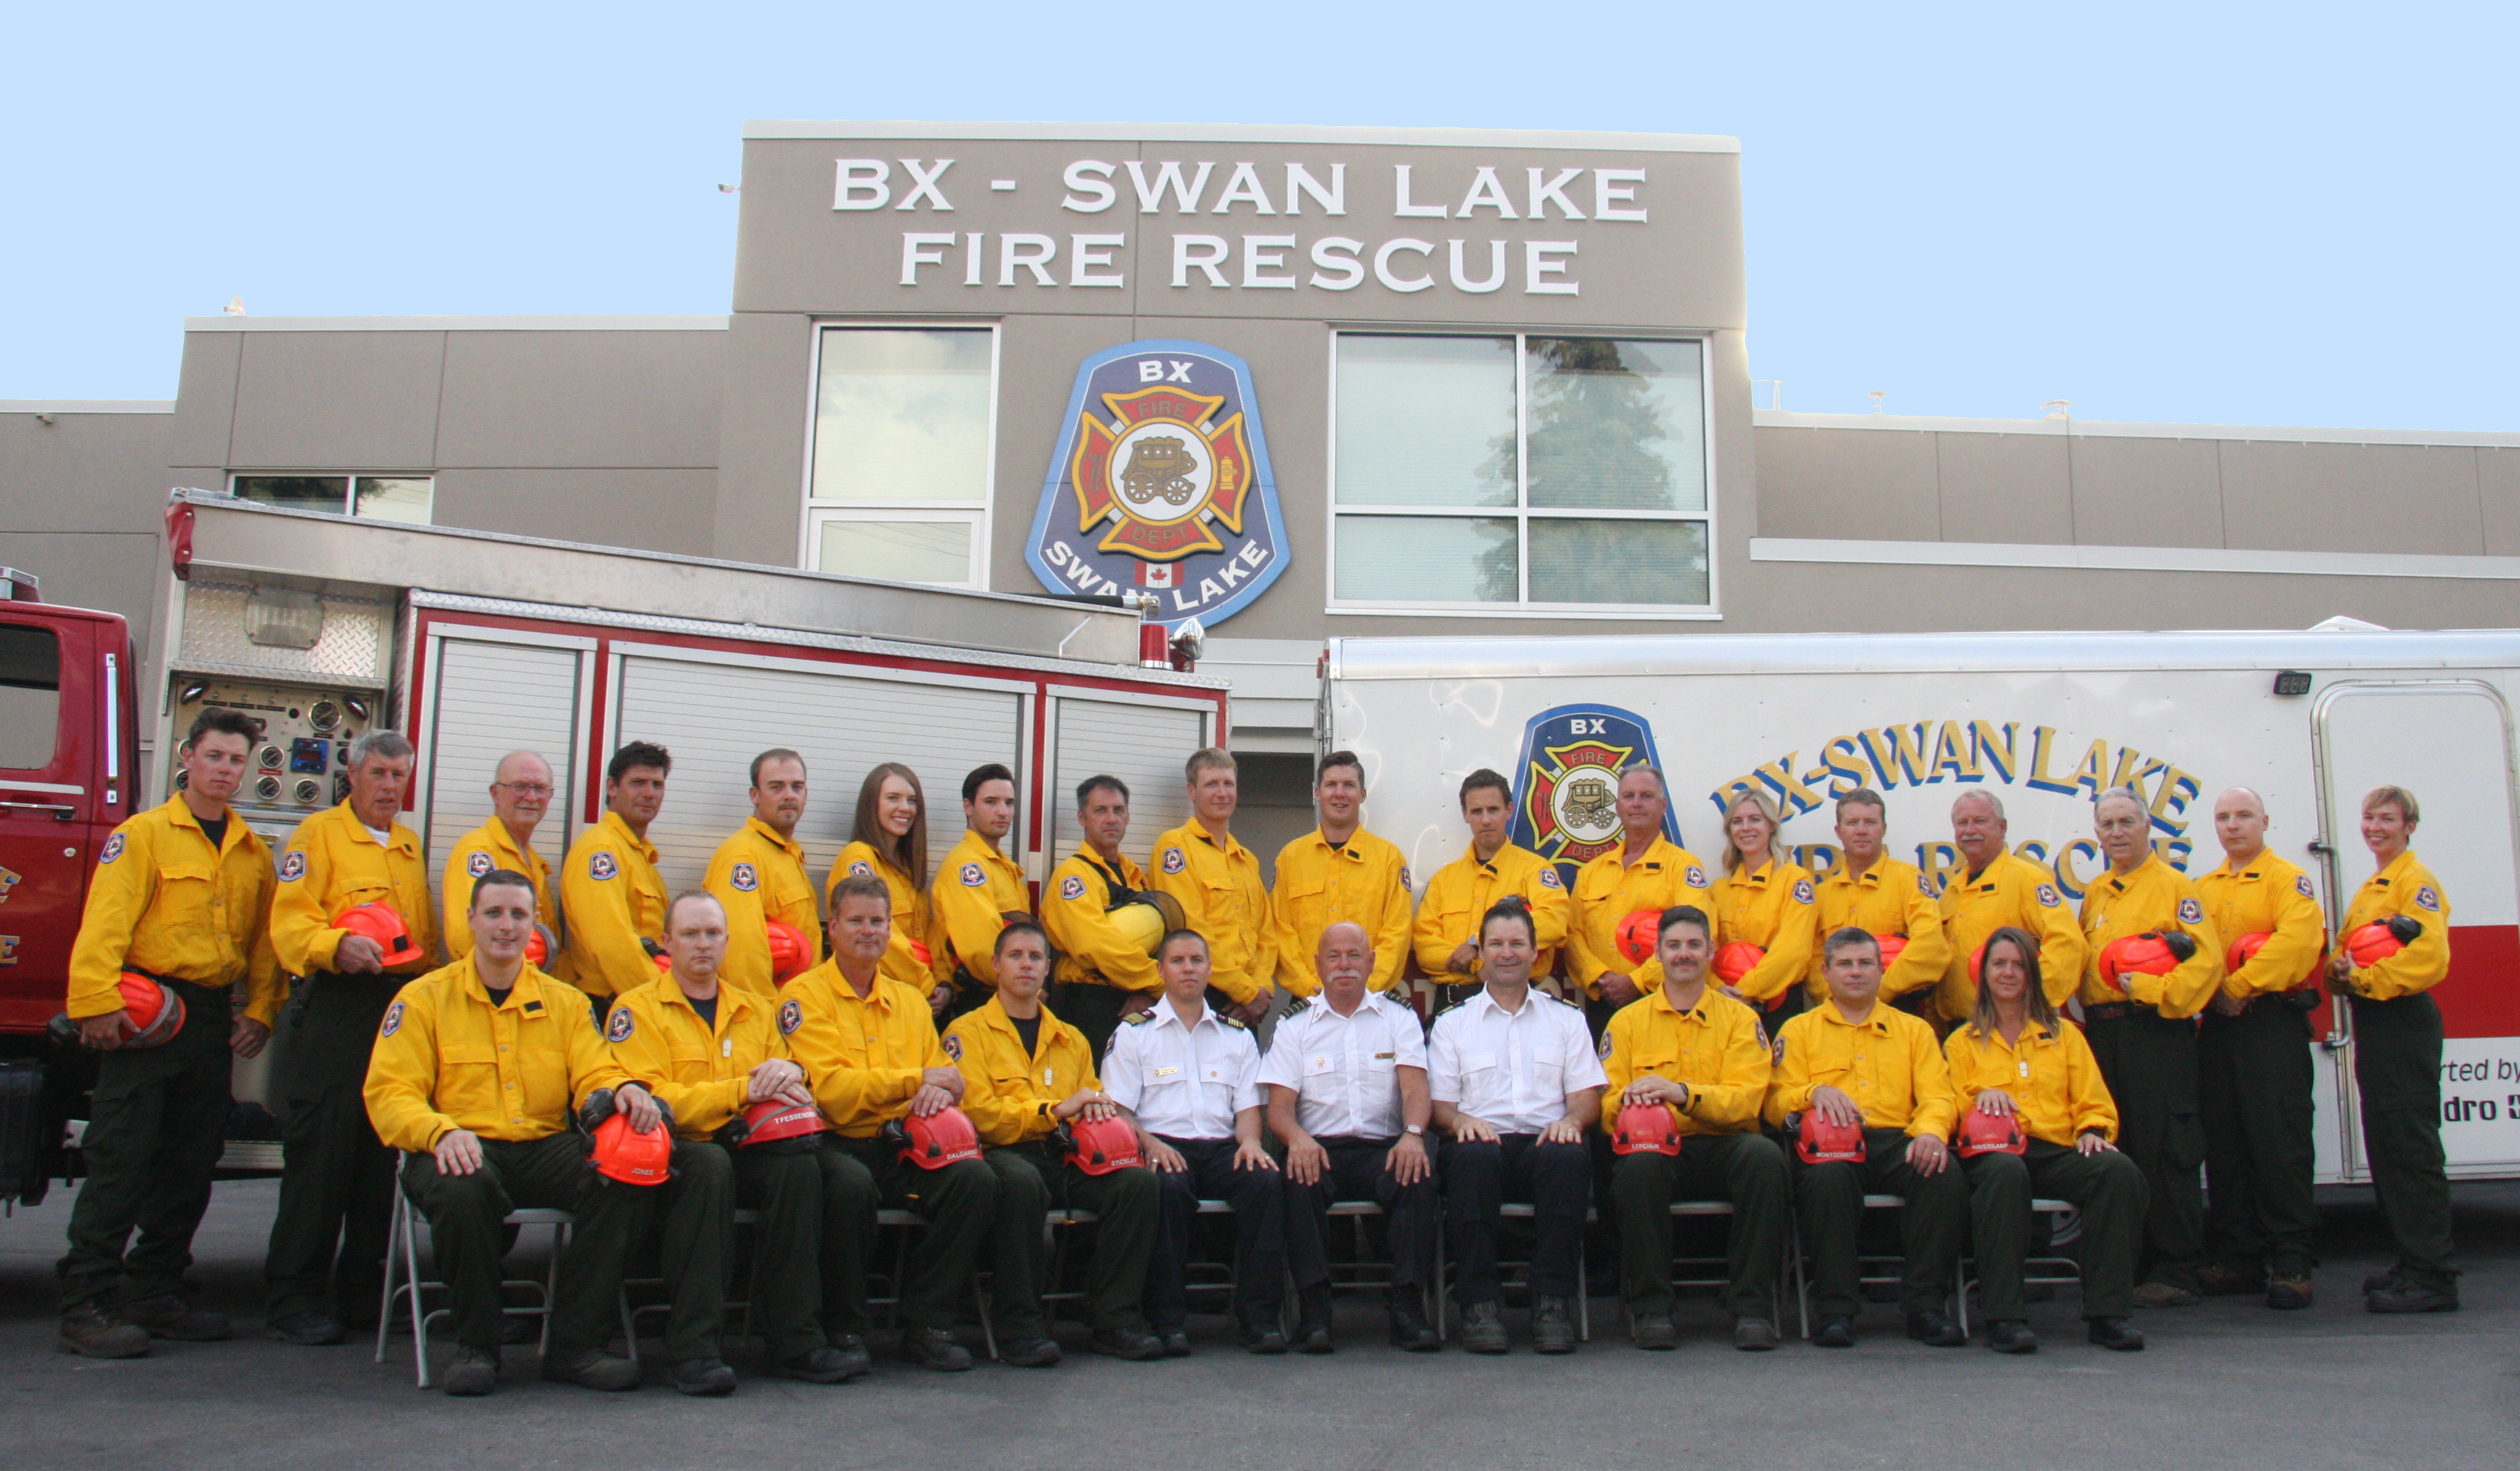 BX Swan Lake Fire Rescue 2018 Team